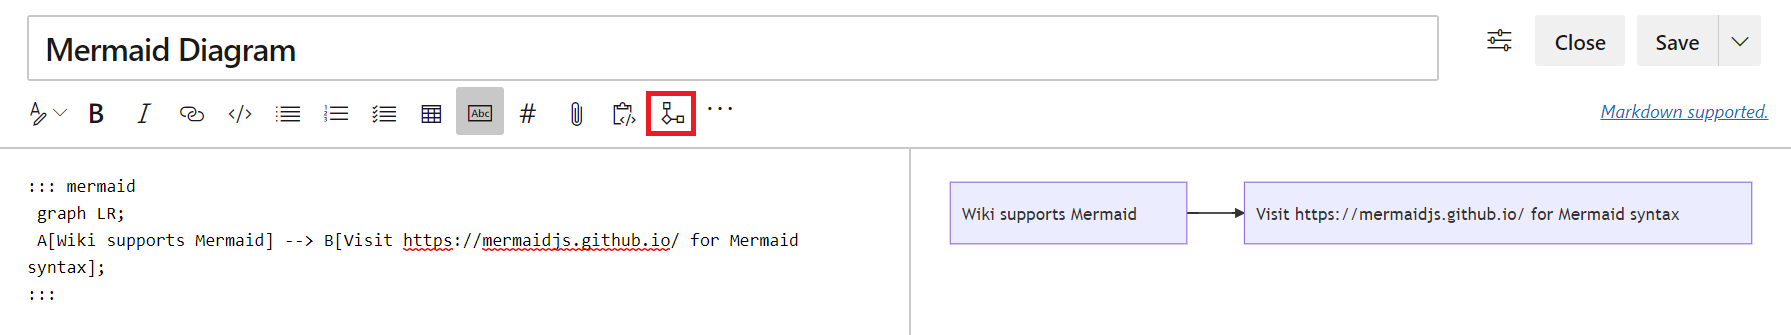 Mermaid diagram support in wiki